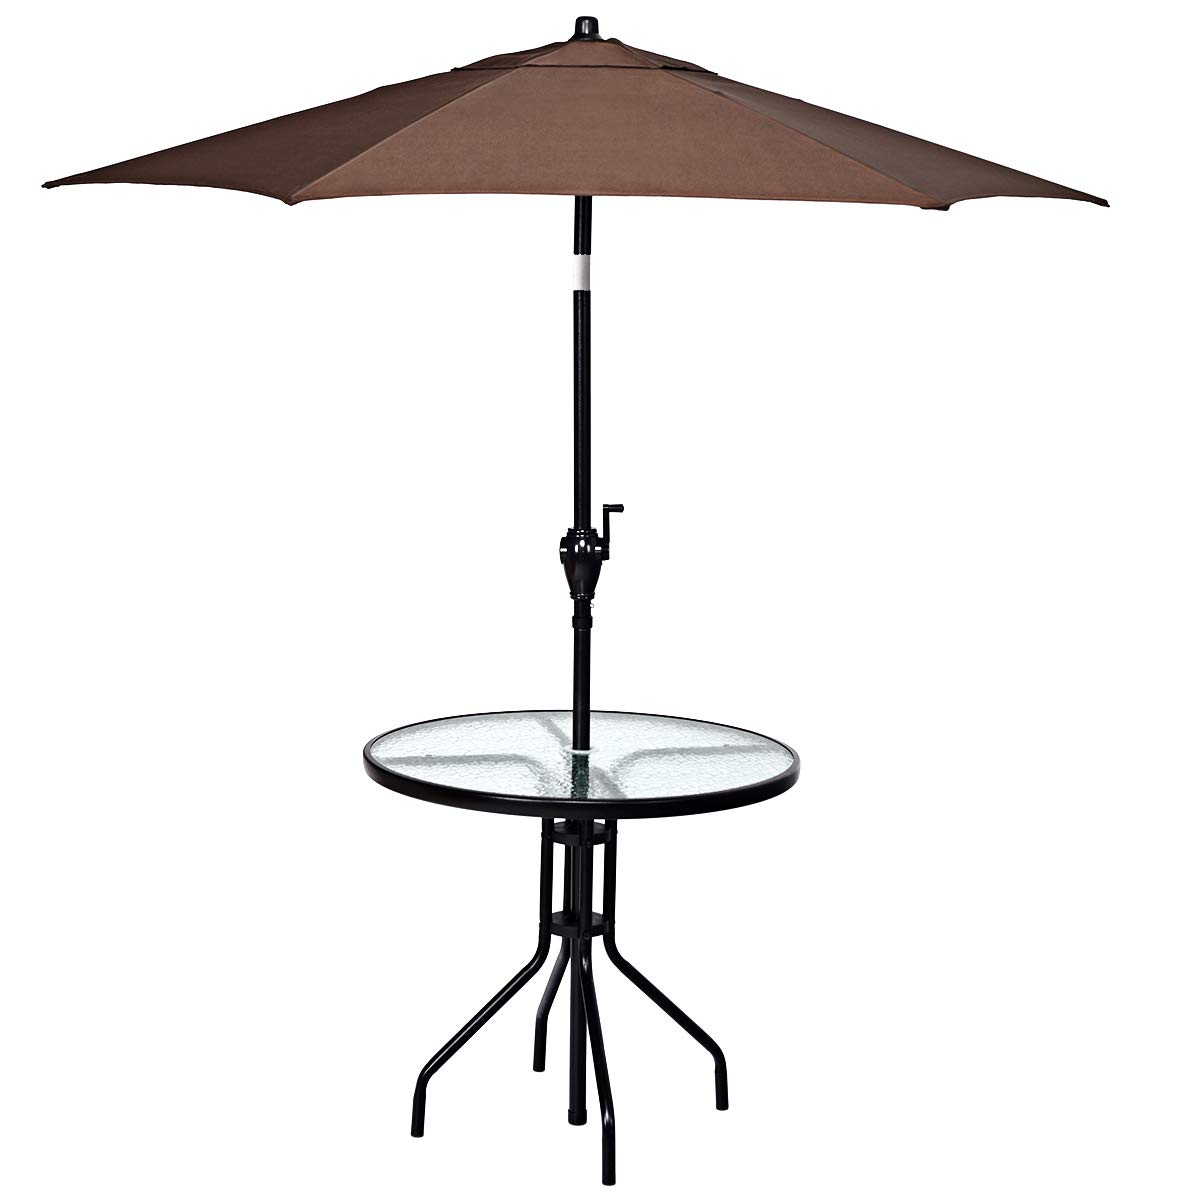 Tangkula 2PC Garden Furniture Set, Patio Garden Set with 32'' Round Table and 6.6ft Umbrella (Black Round Table & Brown Umbrella)